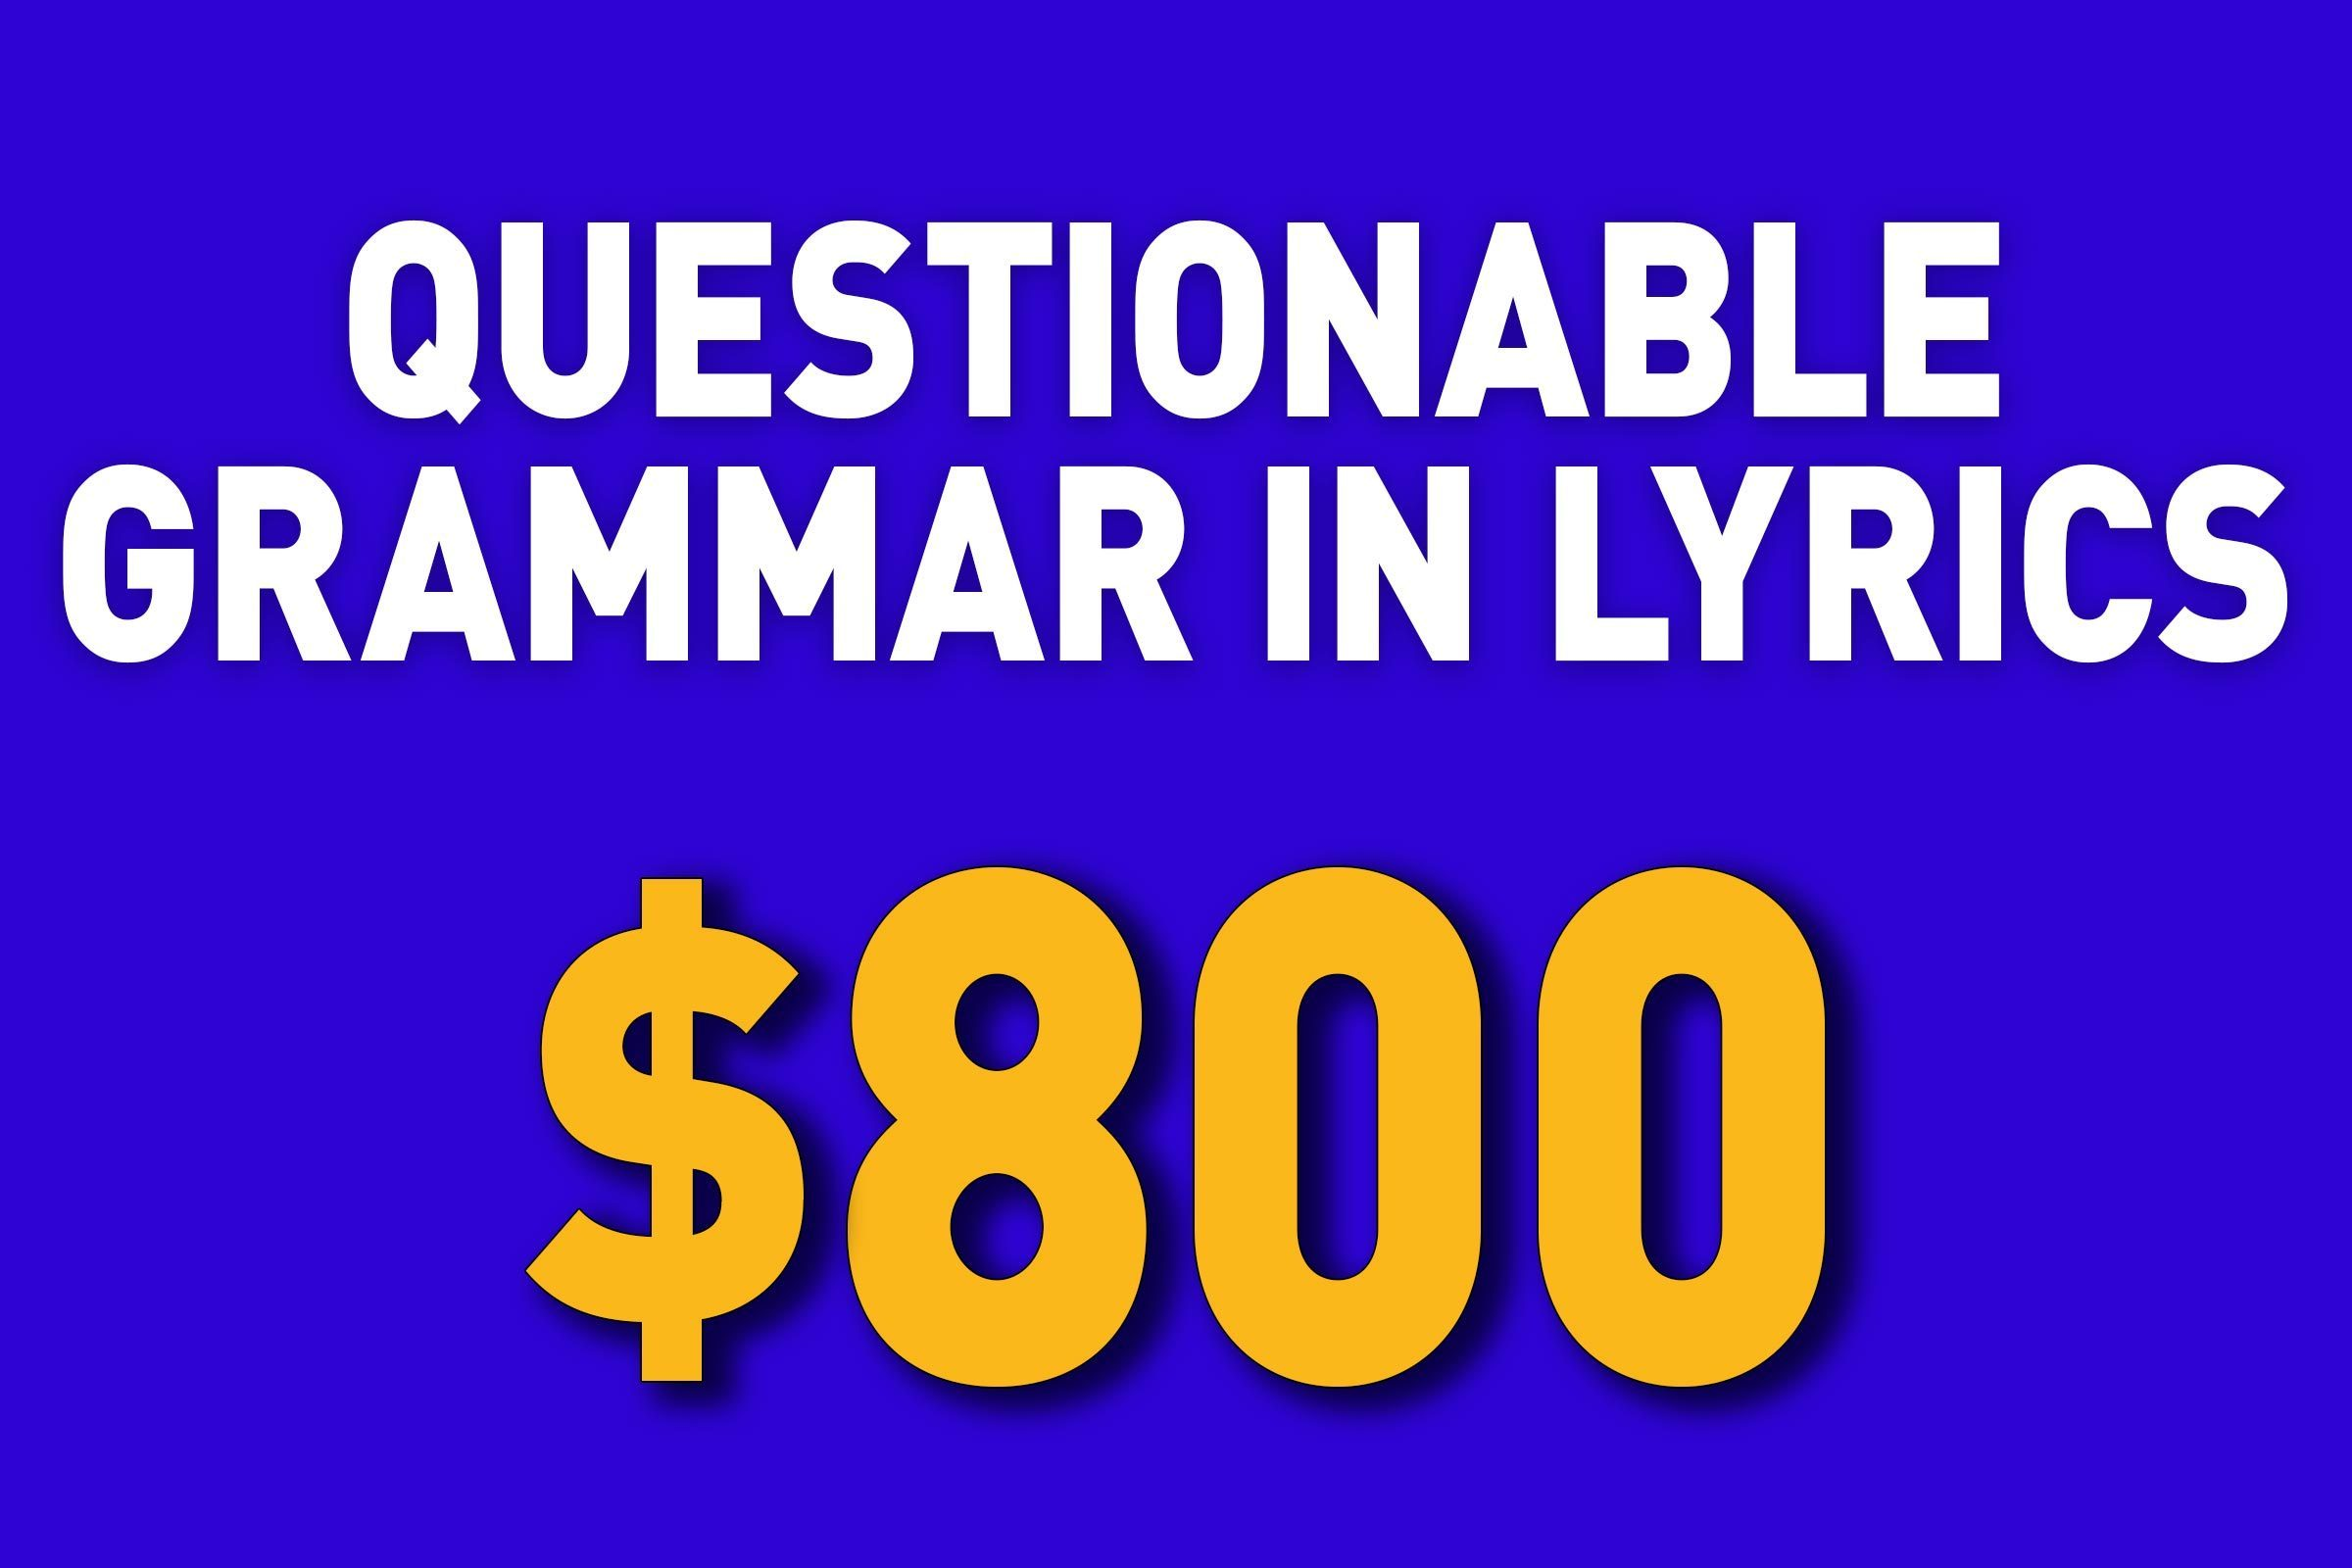 Questionable Grammar in Lyrics for $800